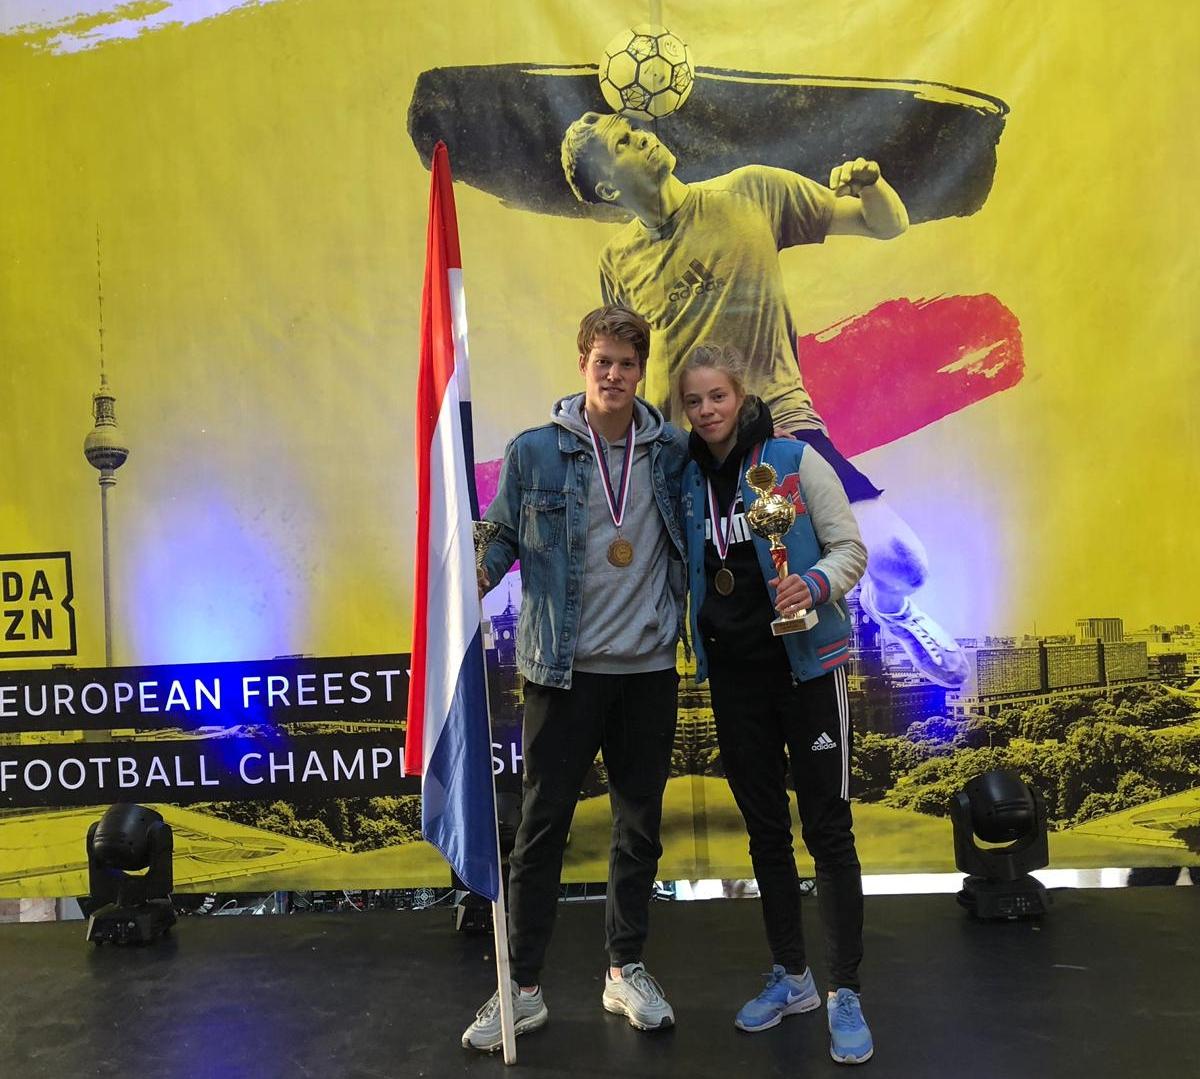 European Freestyle Football Championship - 1e plaats Laura Dekker3e plaats Jesse Marlet